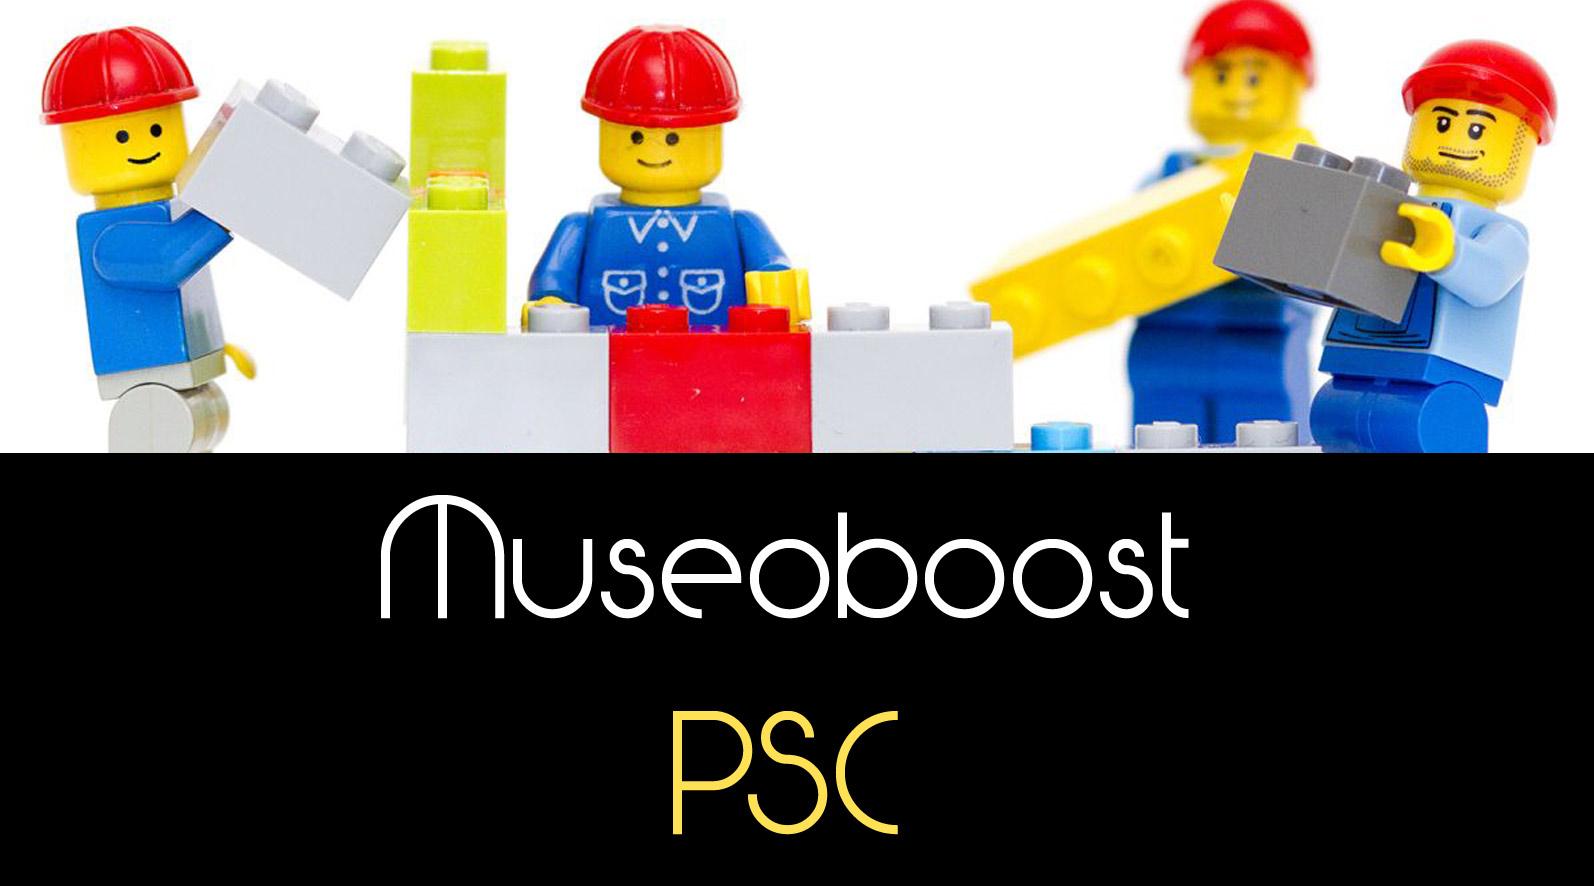 Museoboost PSC